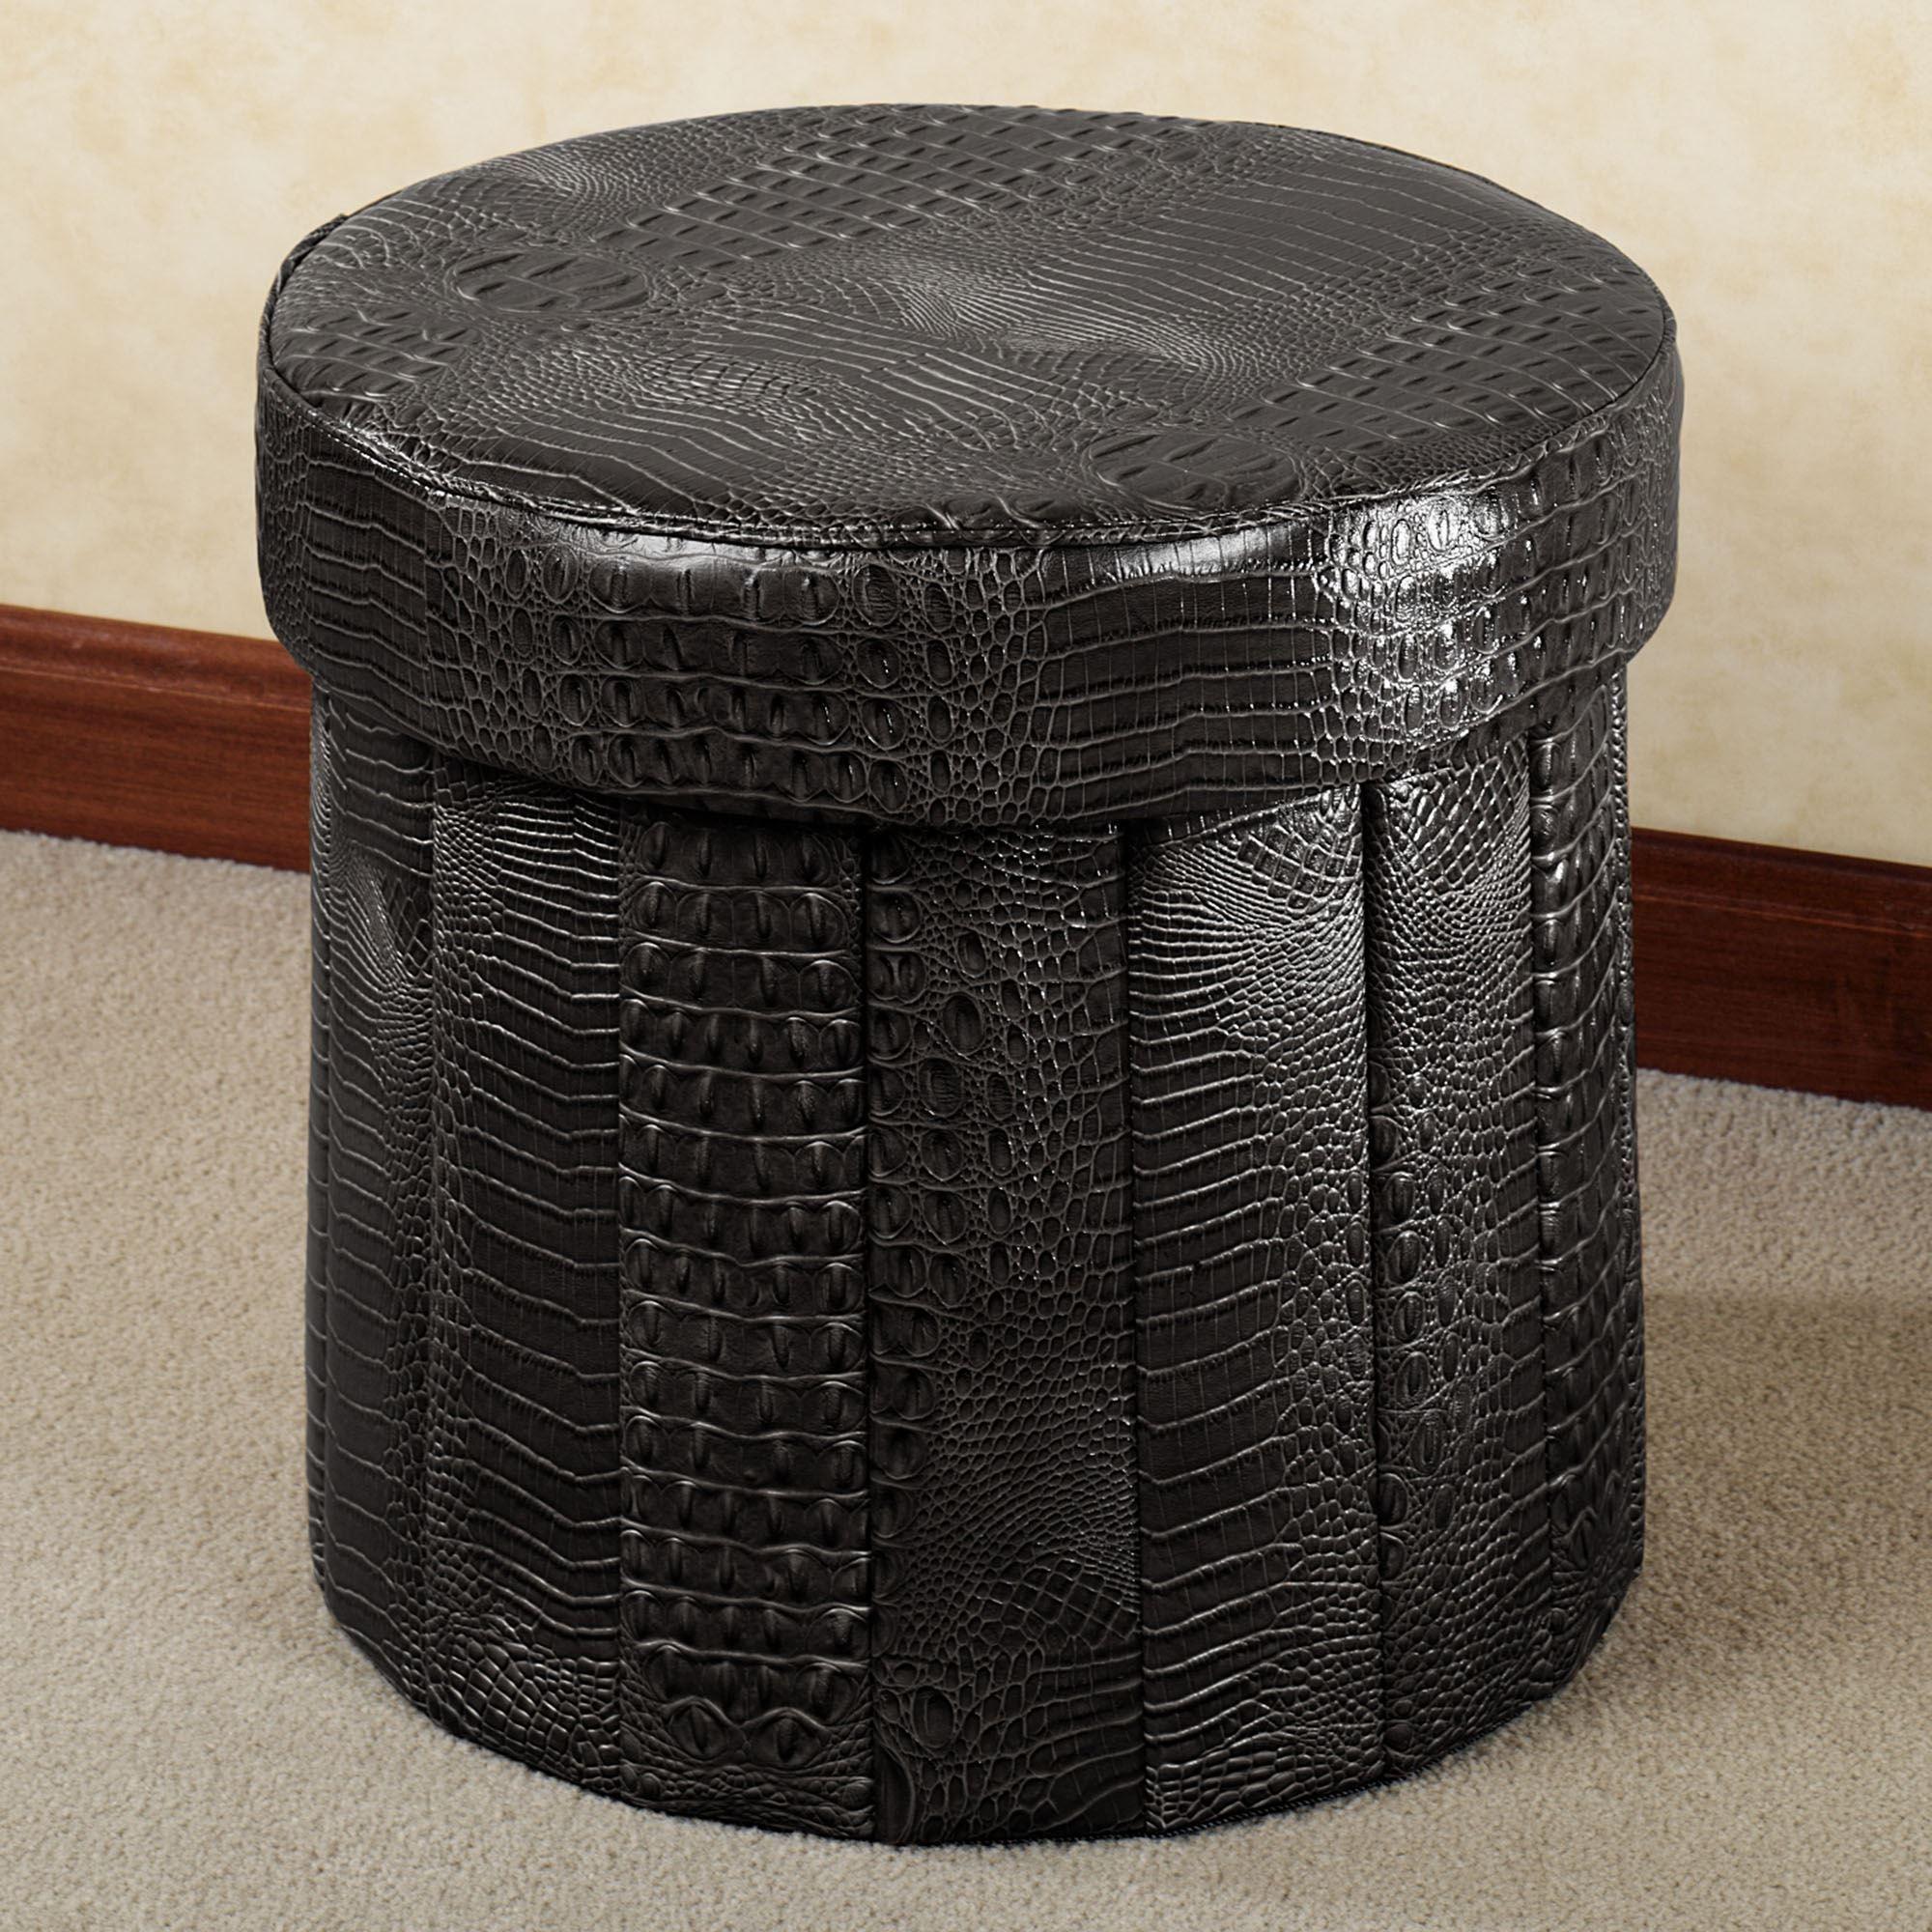 Strange Almas Animal Print Black Faux Leather Round Storage Ottoman Bralicious Painted Fabric Chair Ideas Braliciousco